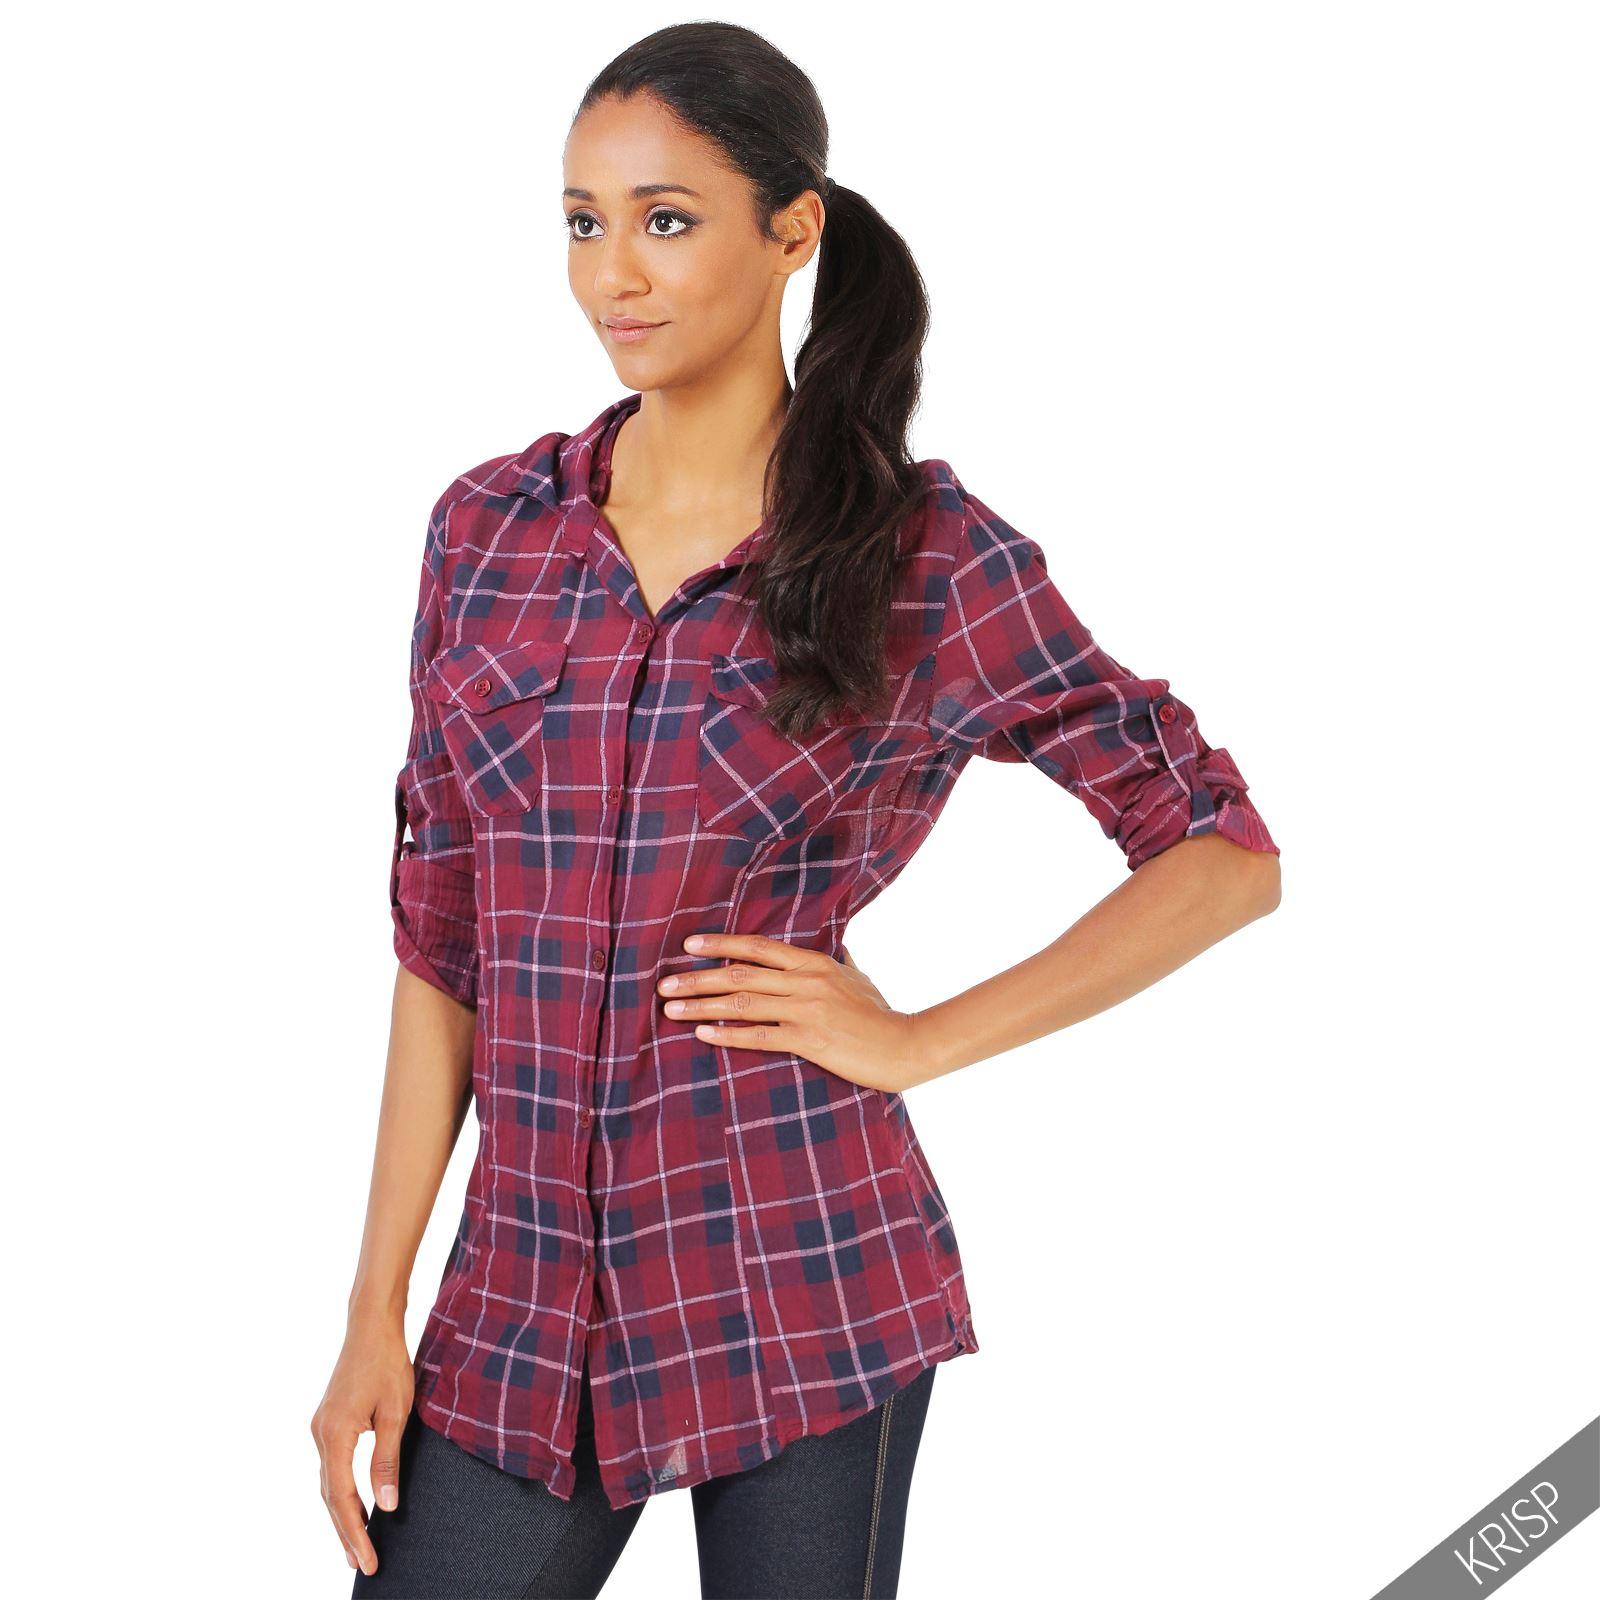 Viyella Sport Shirt - Grey Green Plaid () Viyella Sport Shirt - Pine & Brown Check Check () Viyella Sport Shirt - Navy with Red Grid ().